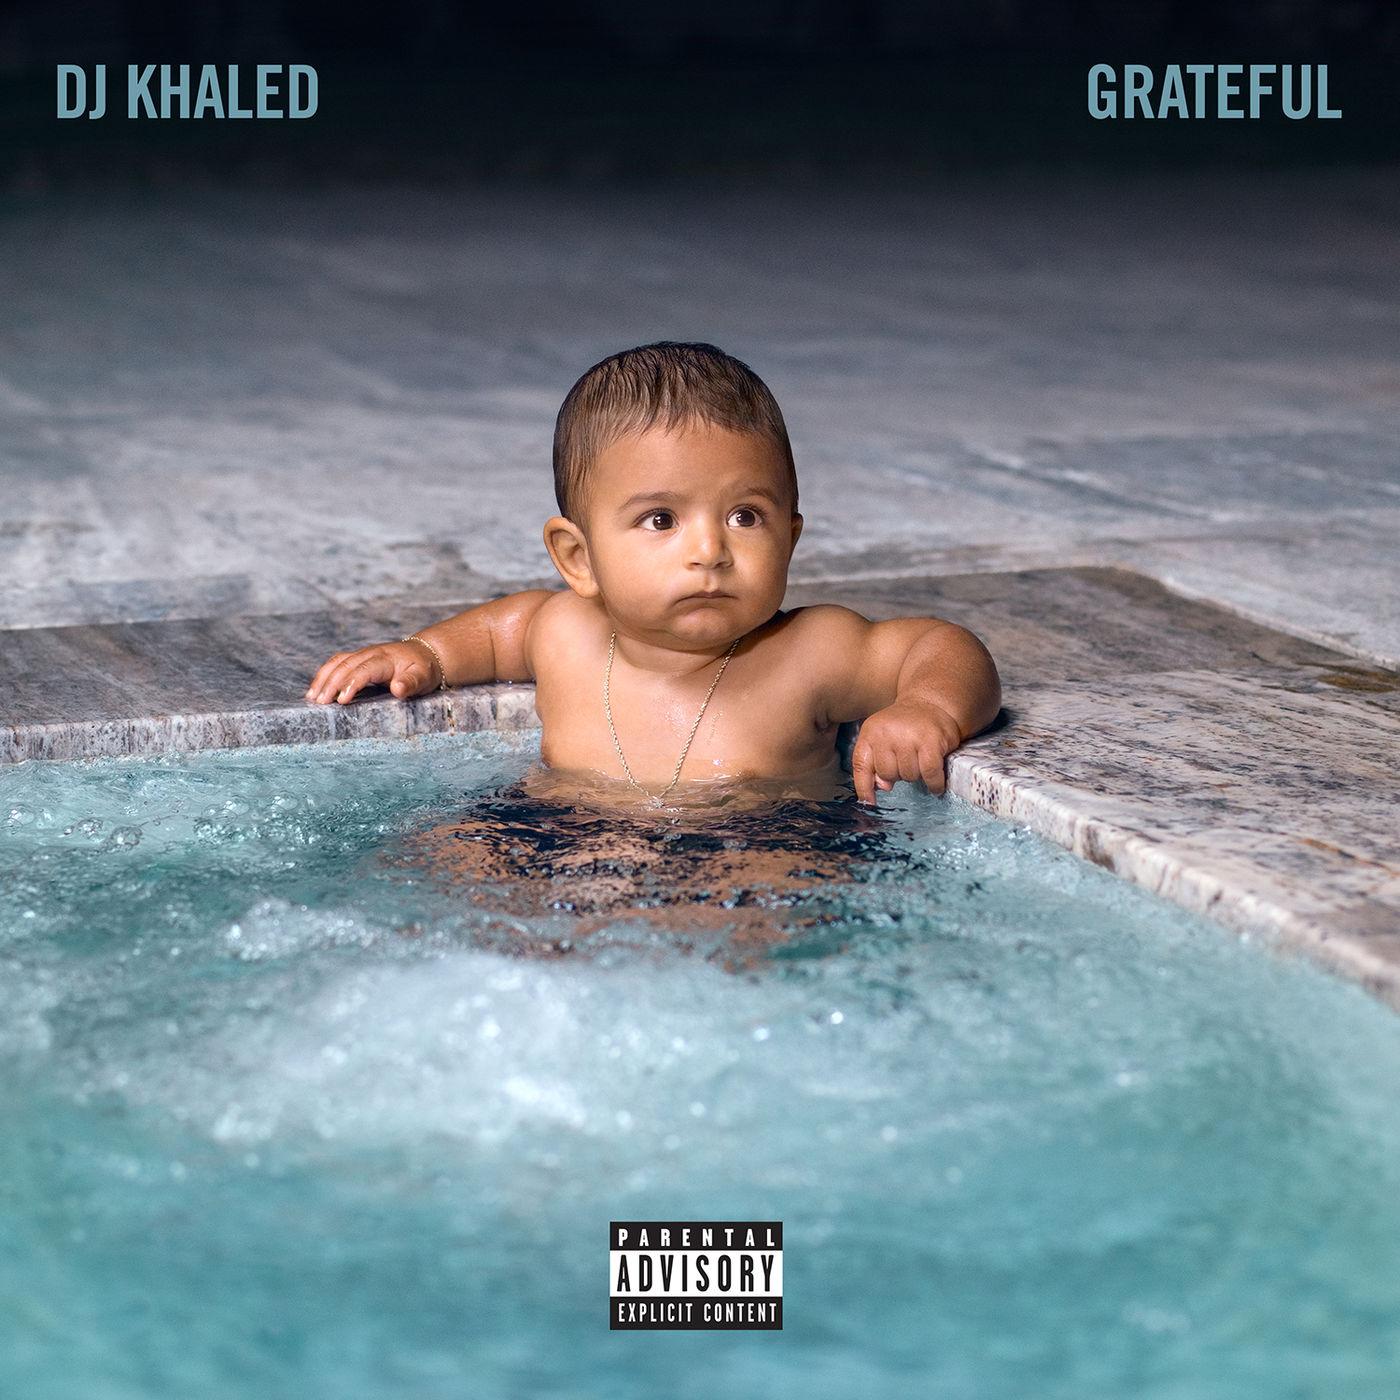 DJ Khaled Shares Absurdly Star-Studded Grateful Tracklist